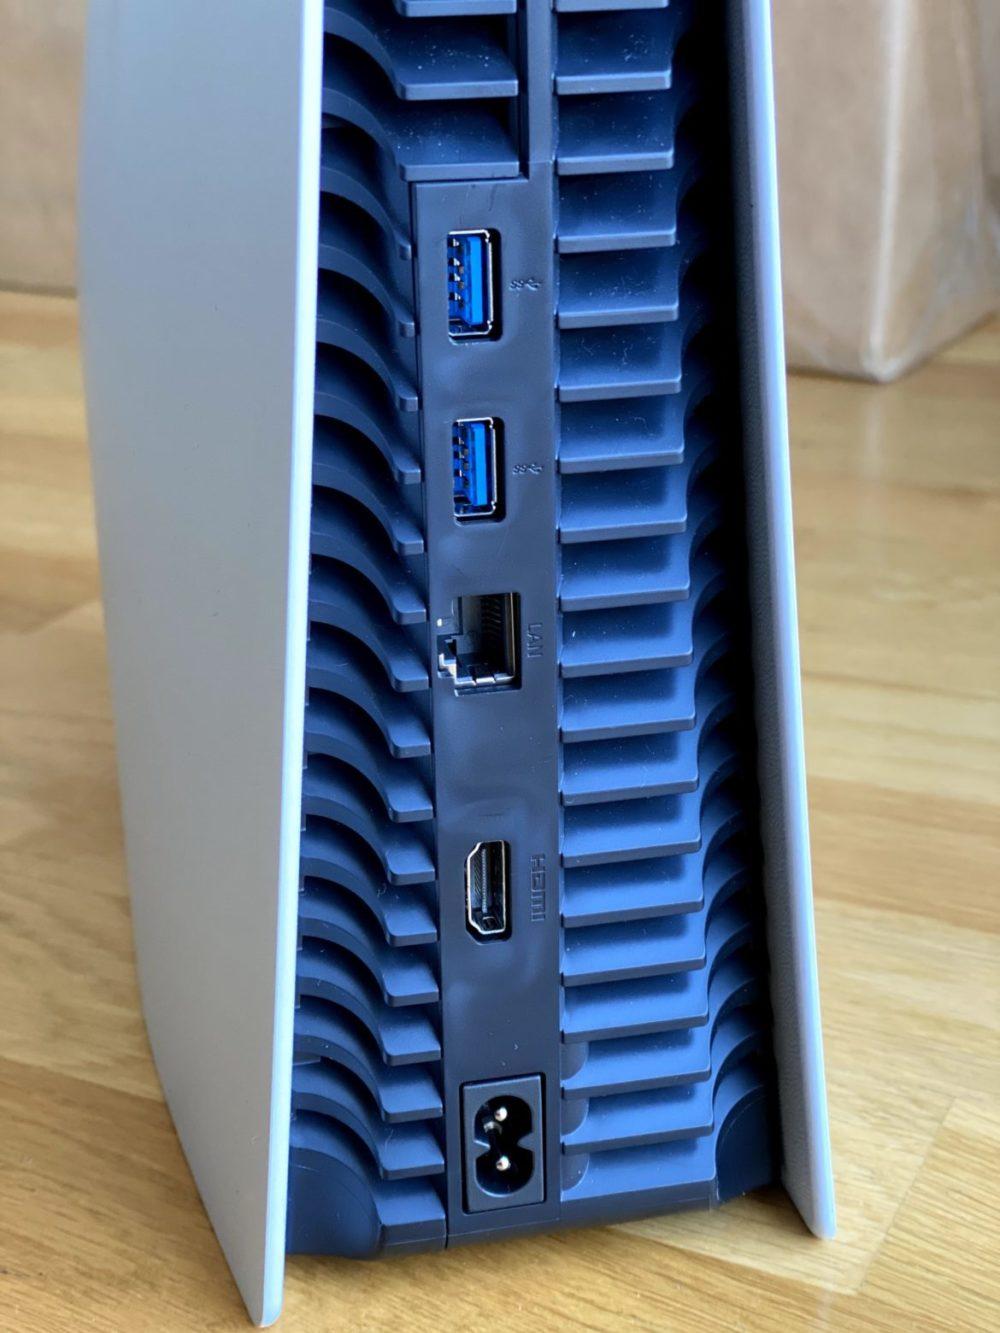 PS5 baksida konsol